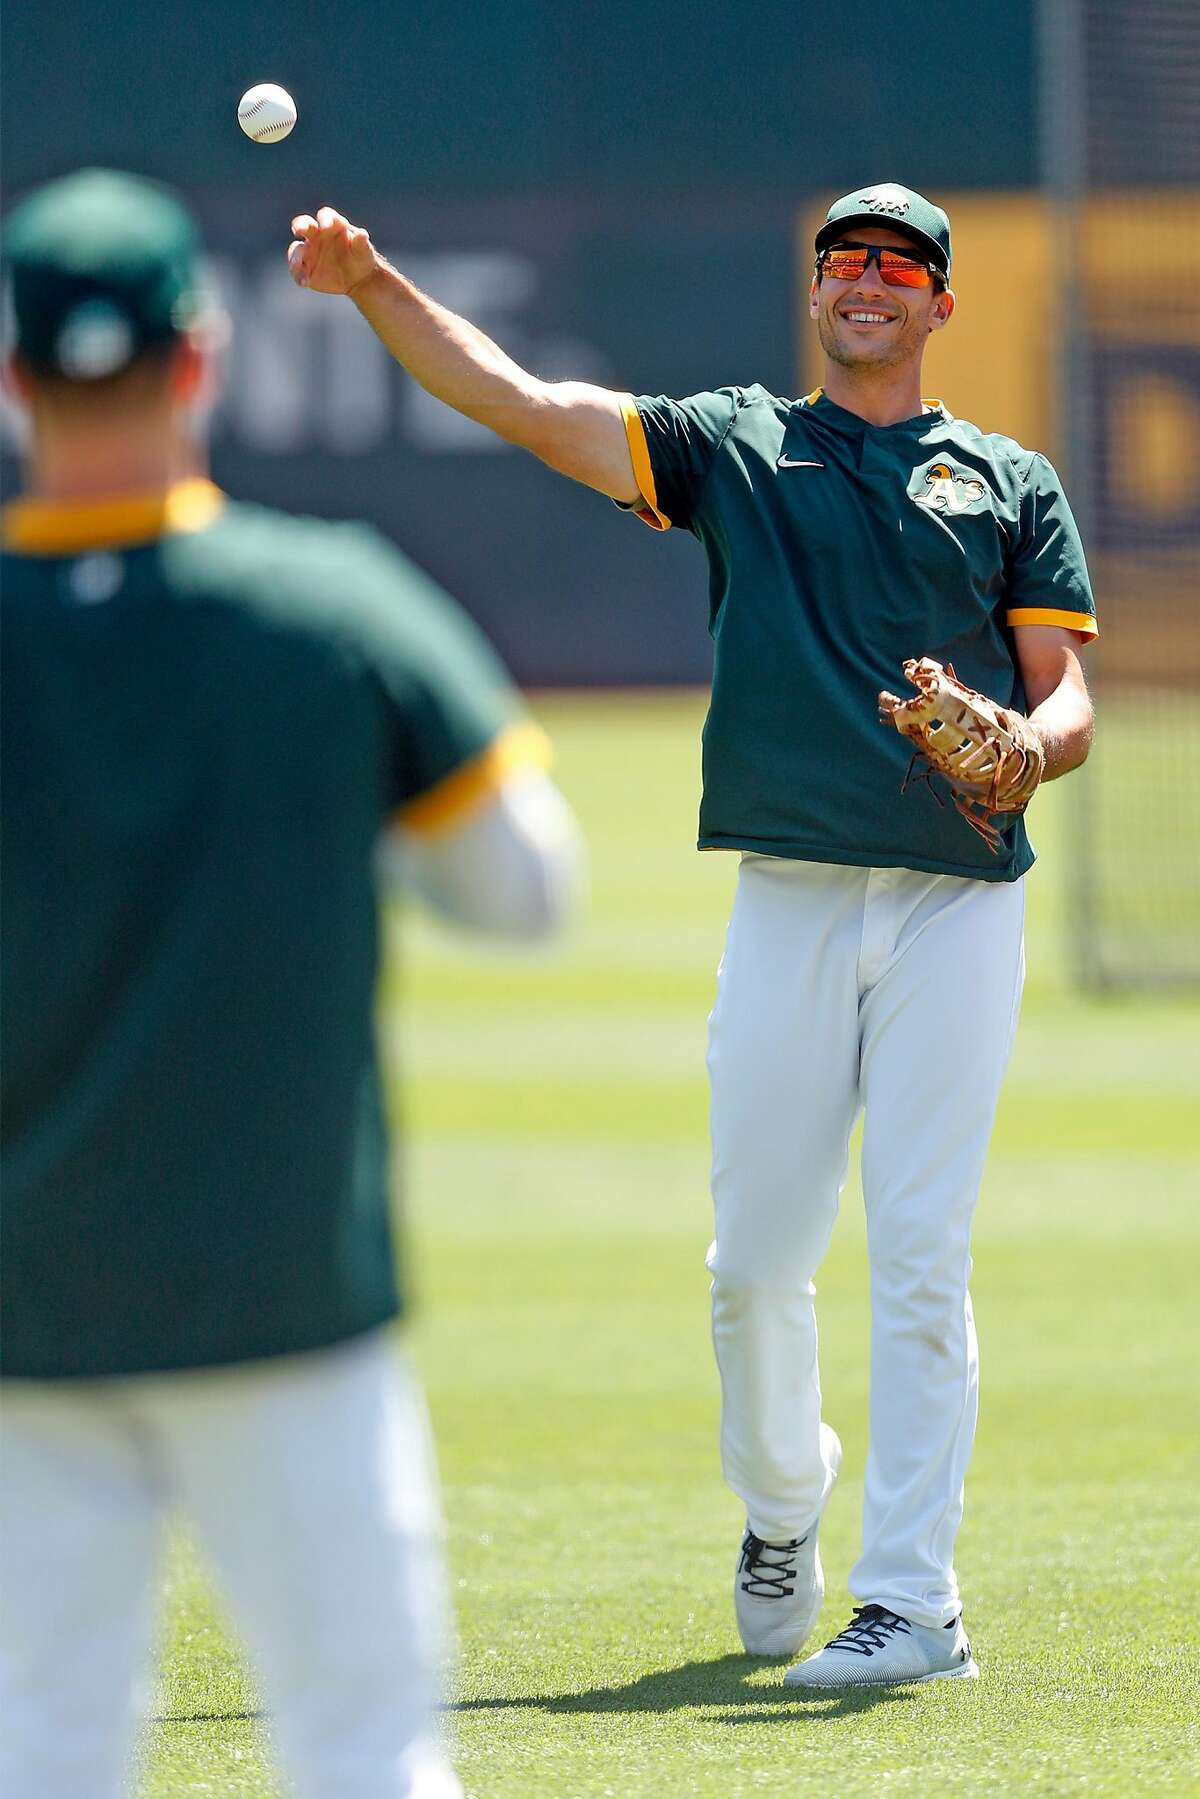 Oakland Athletics' Matt Olson tosses a baseball to Matt Chapman during practice at Oakland Coliseum in Oakland, Calif., on Wednesday, July 8, 2020.